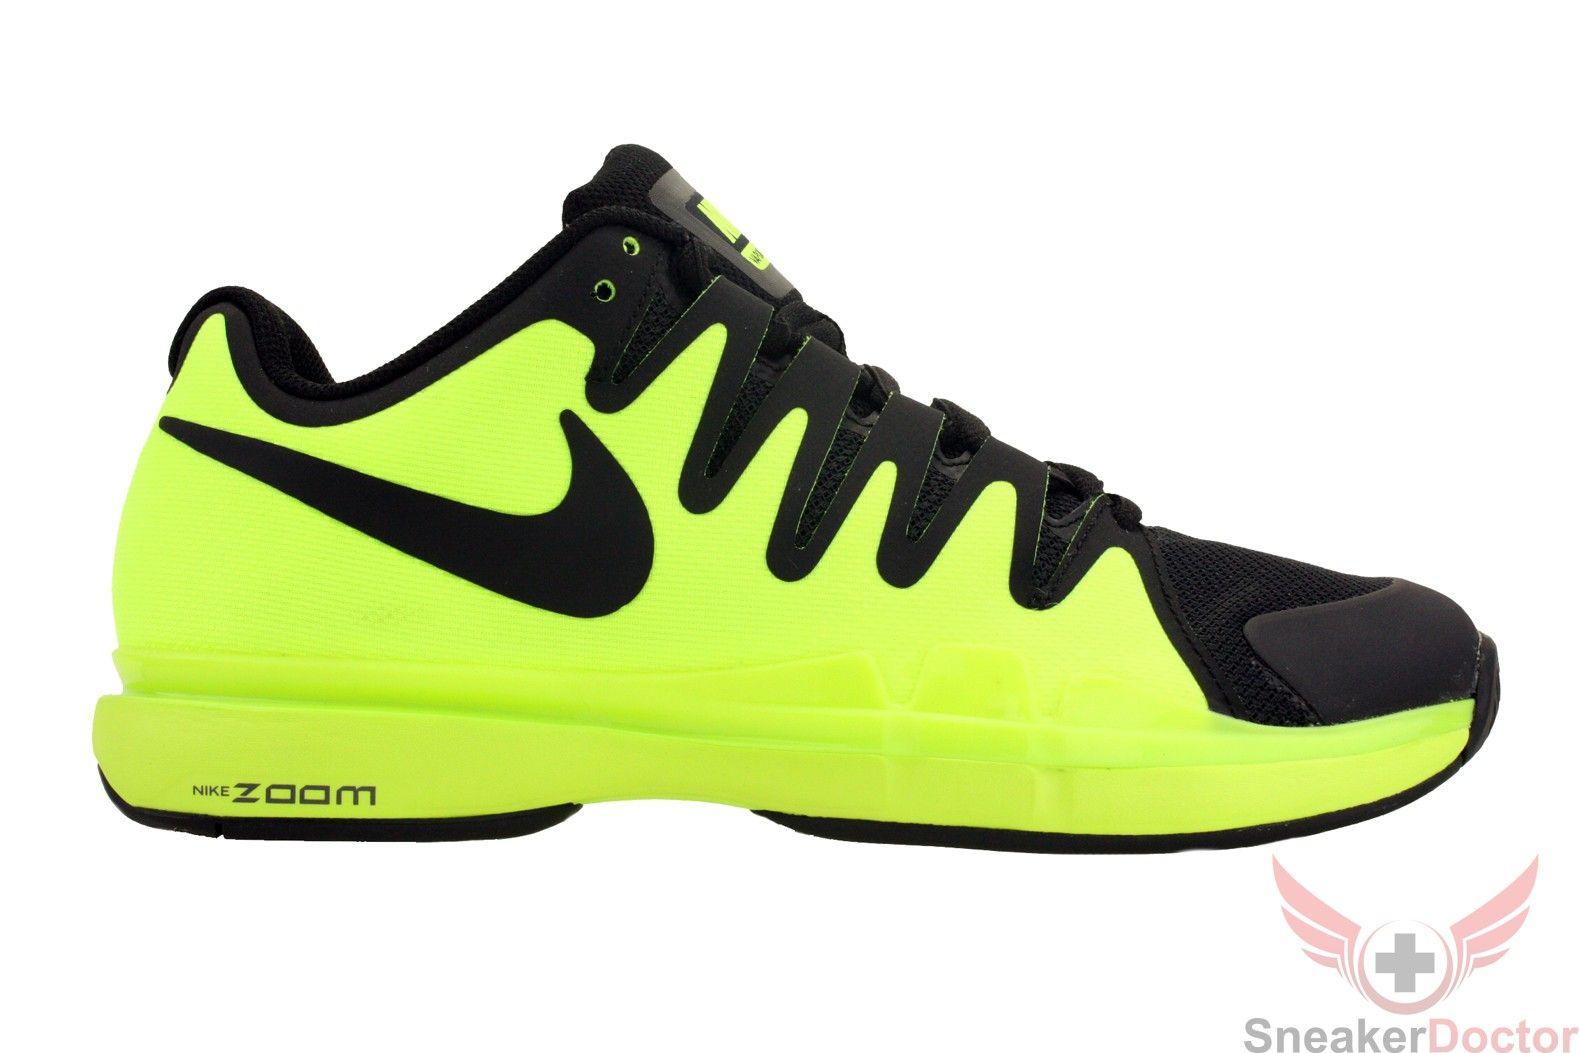 Nike Mens Zoom Vapor 9.5 Tour Tennis Shoes VoltBlackDark